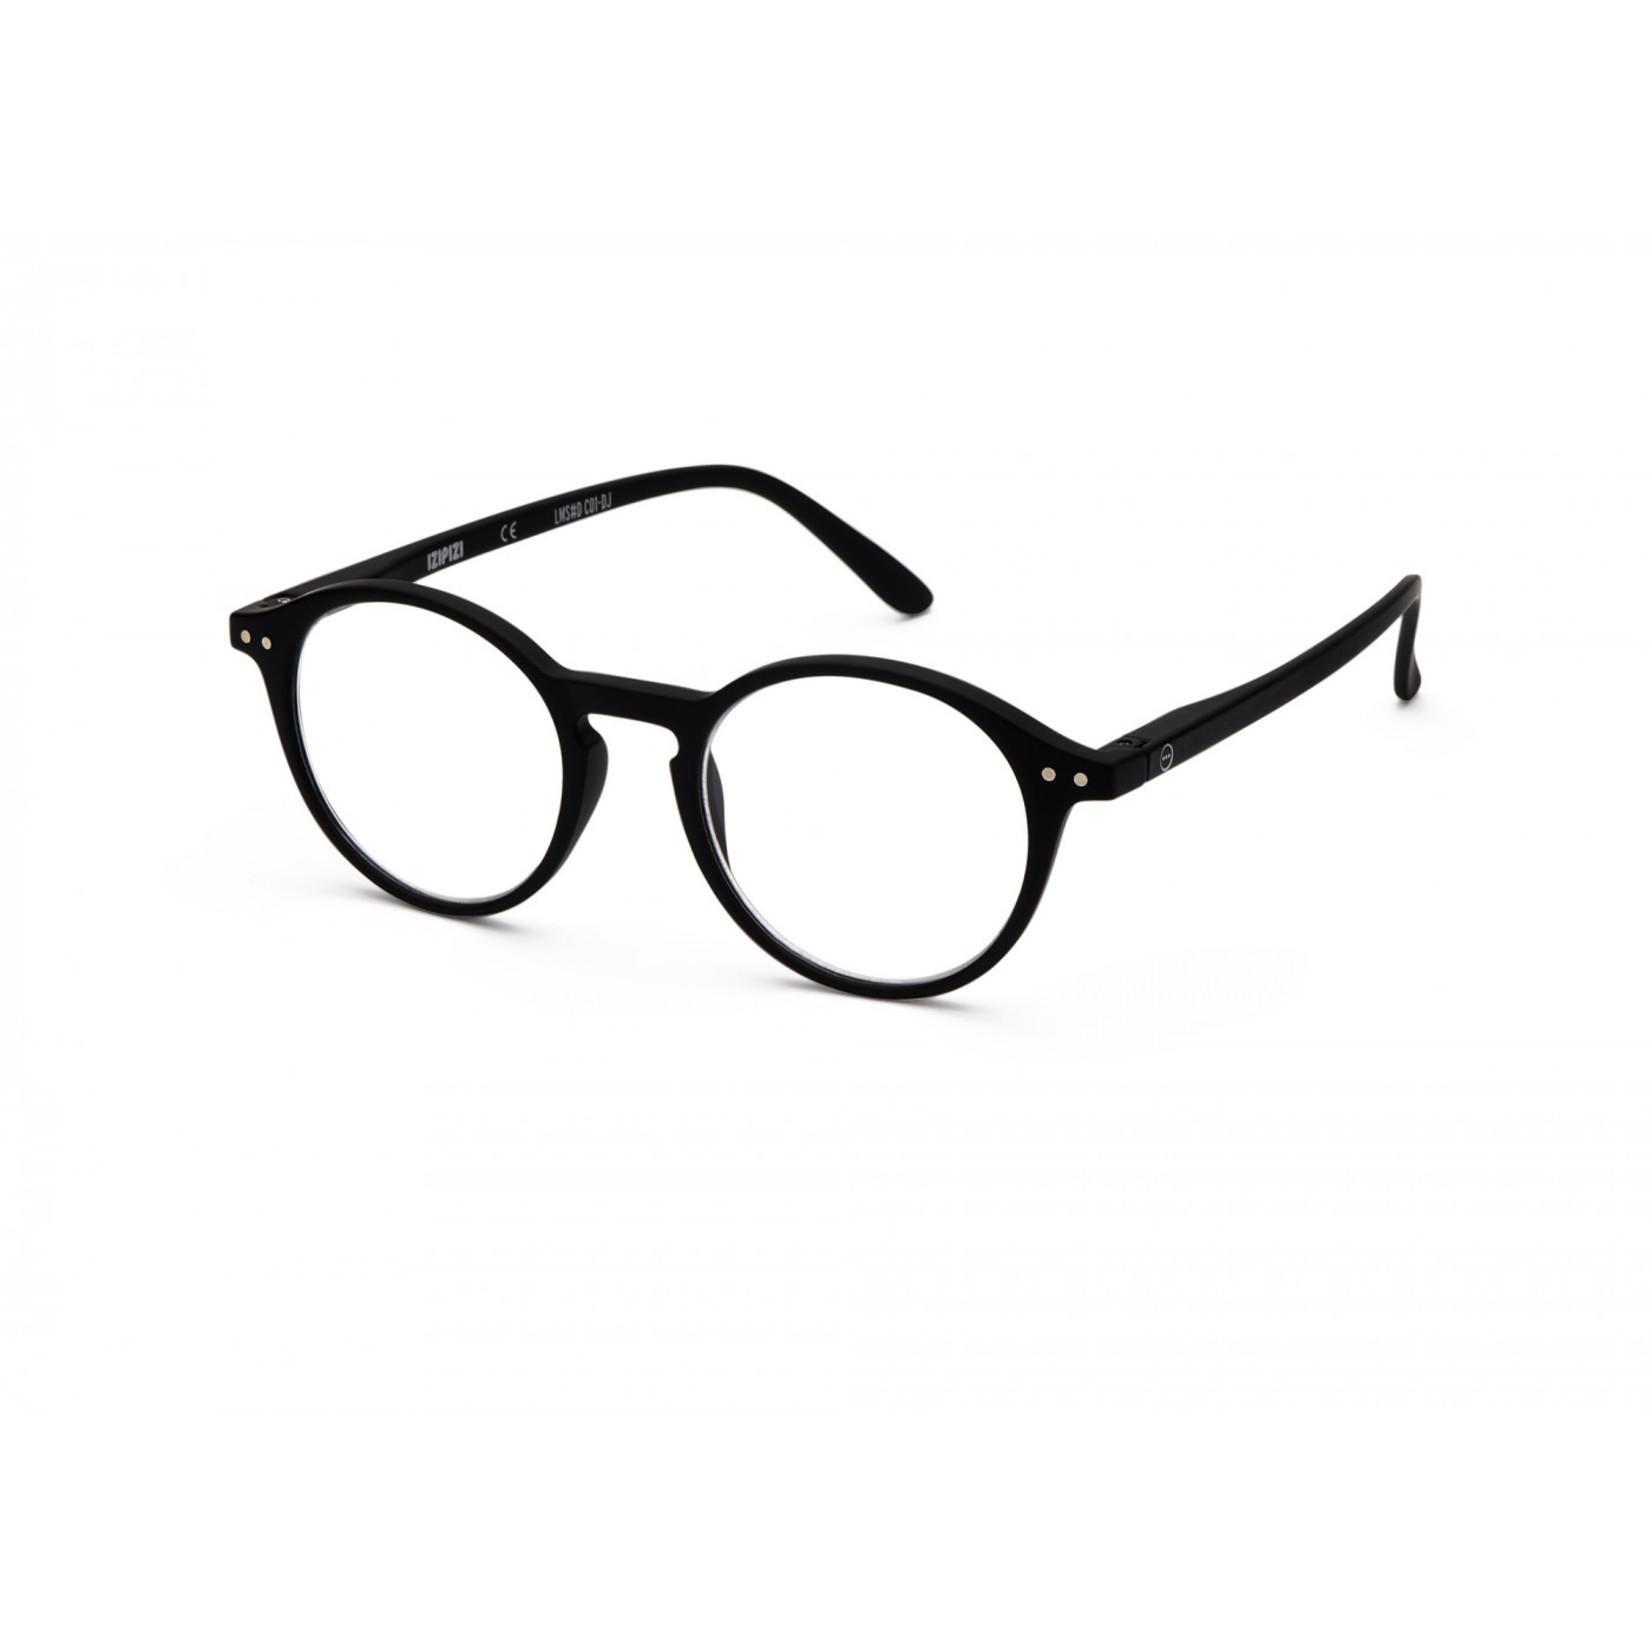 IZIPIZI #D The Iconic Reading Glasses